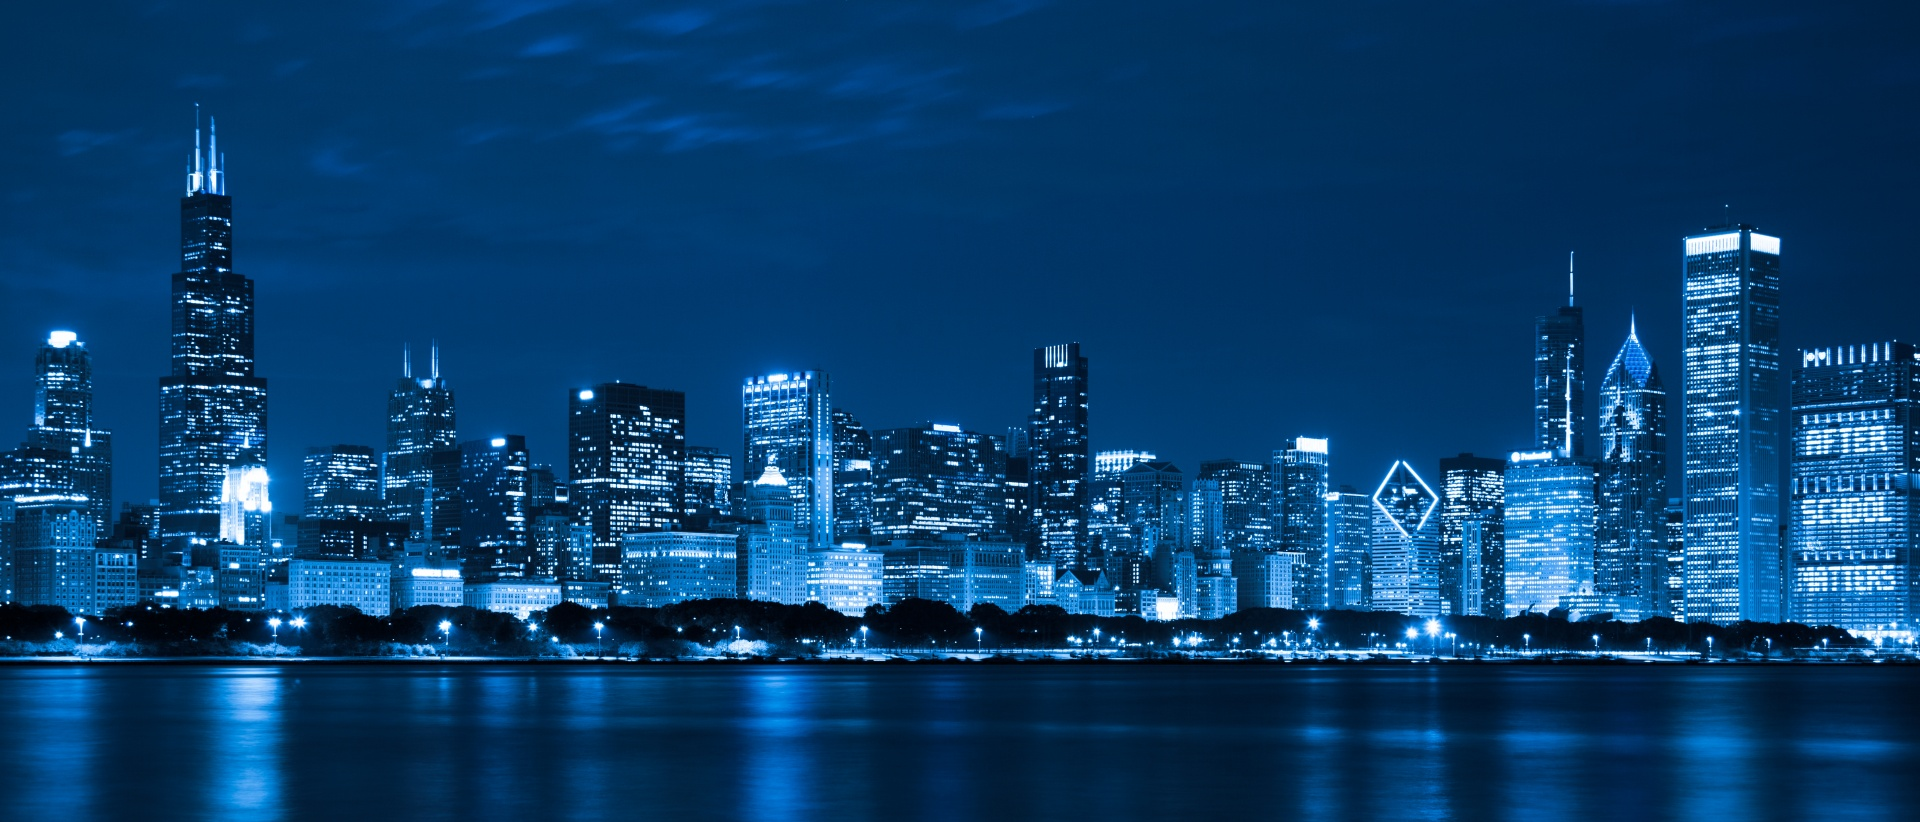 Blue Neon Hd Wallpaper Chicago Skyline At Night Free Stock Photo Public Domain